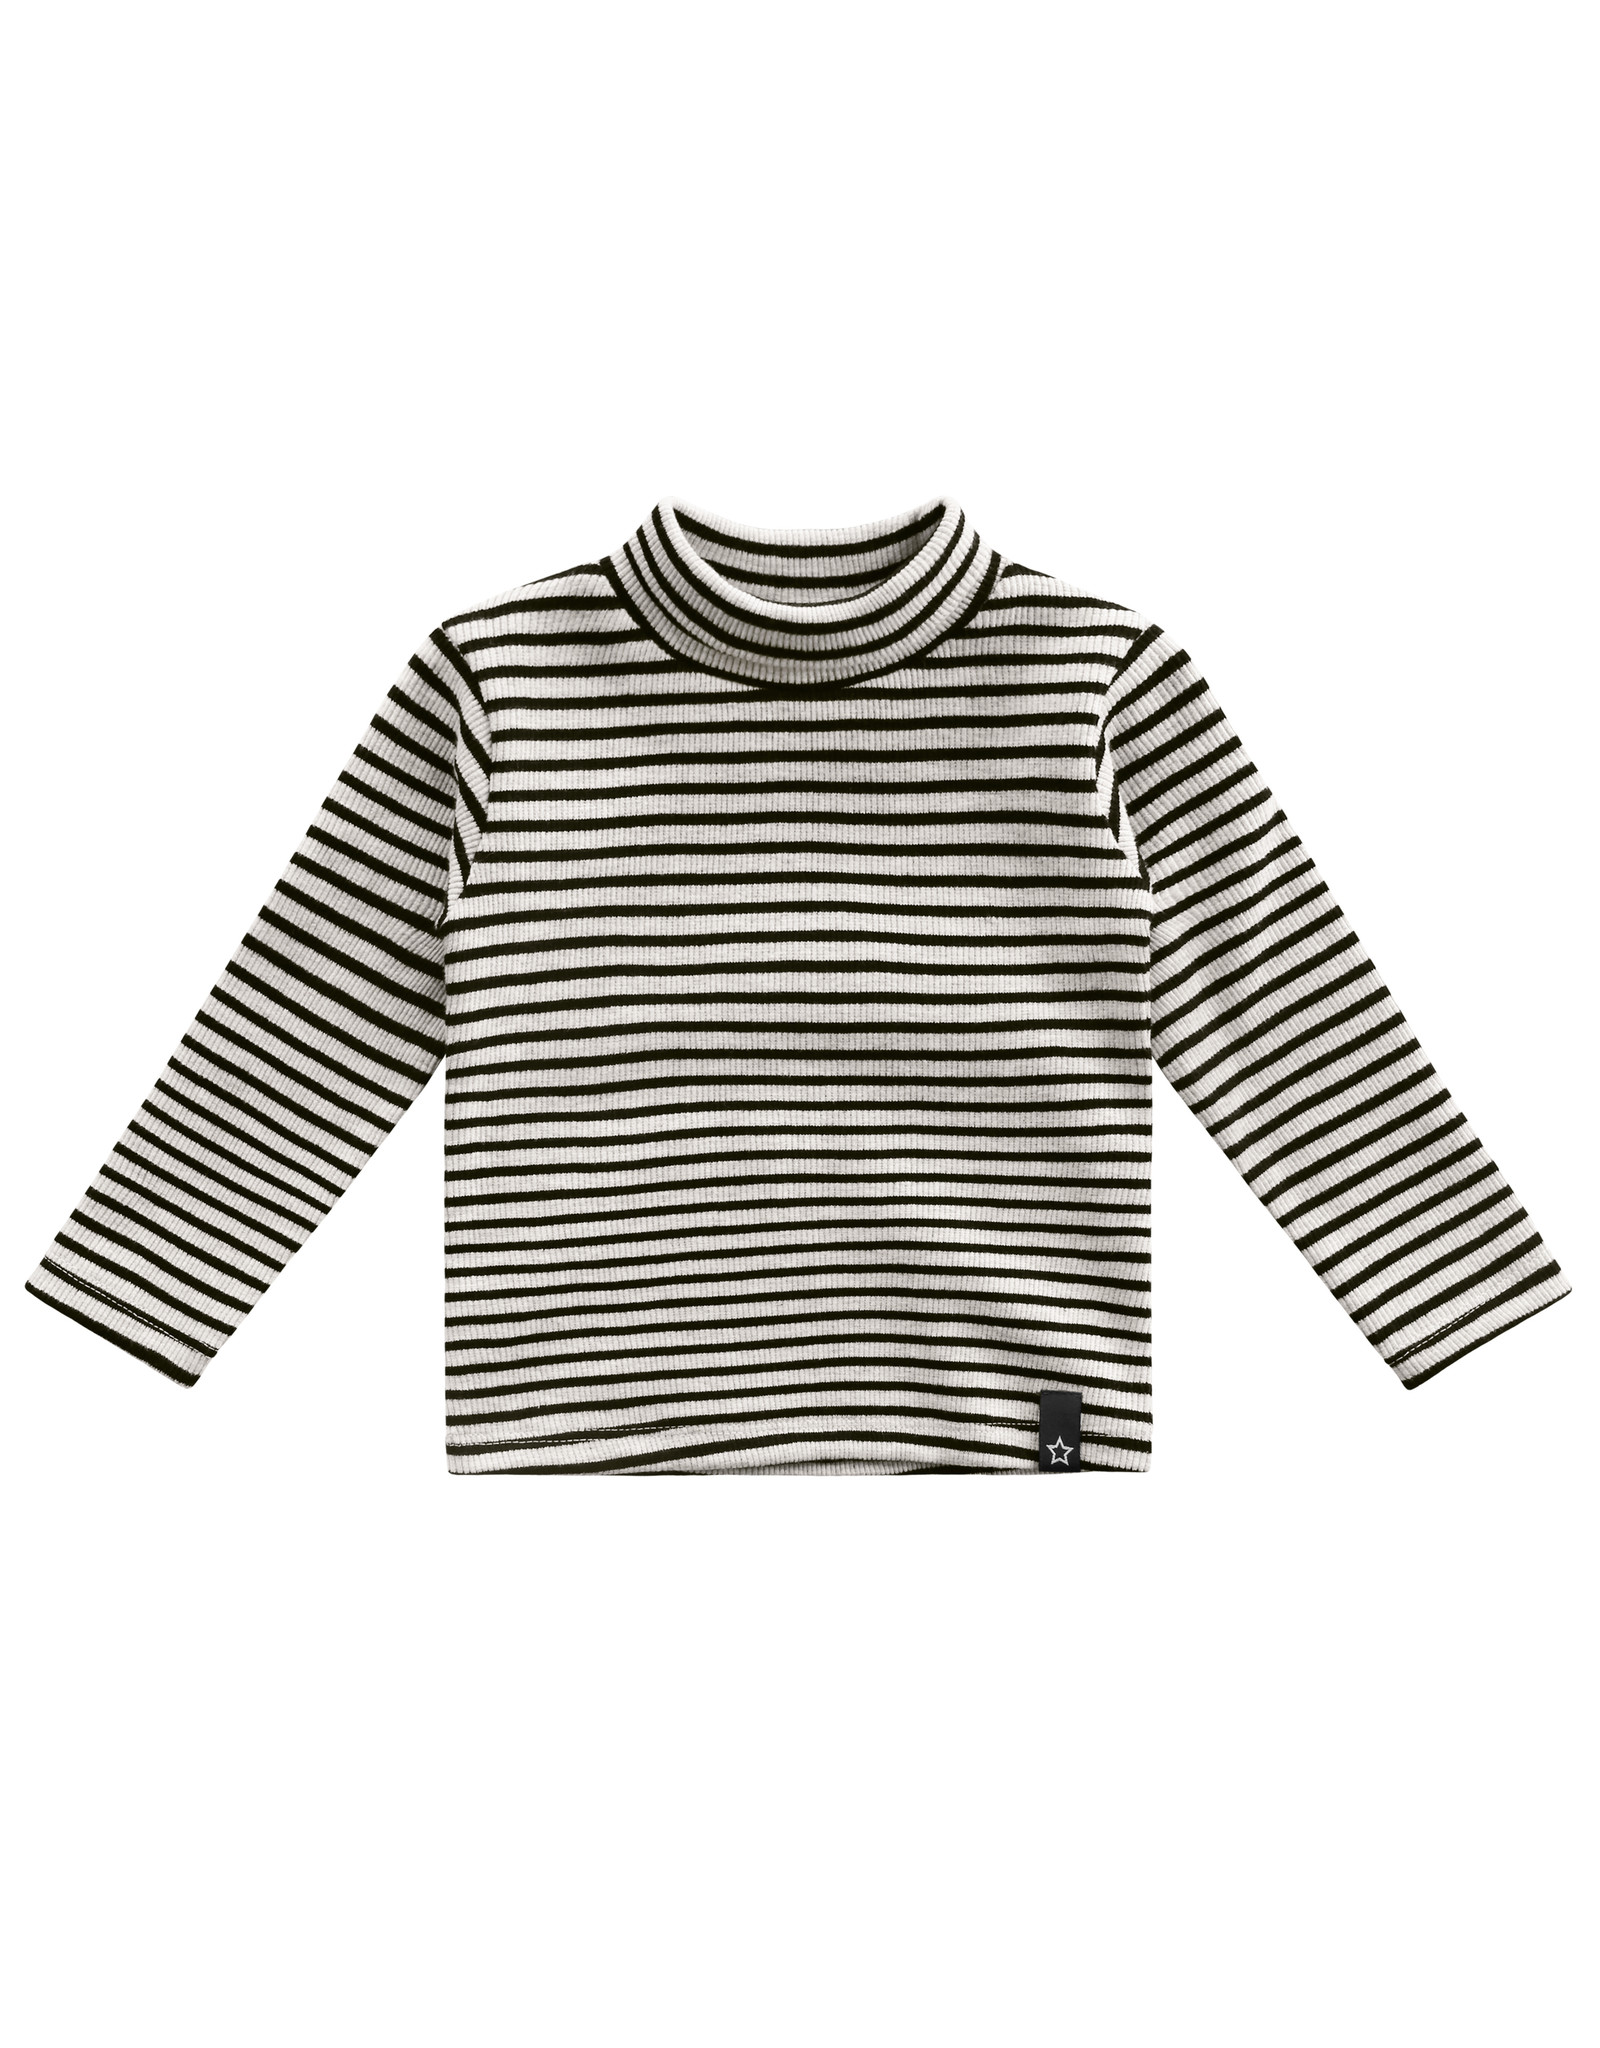 Your Wishes Beige - Stripes | Turtleneck, Chalk